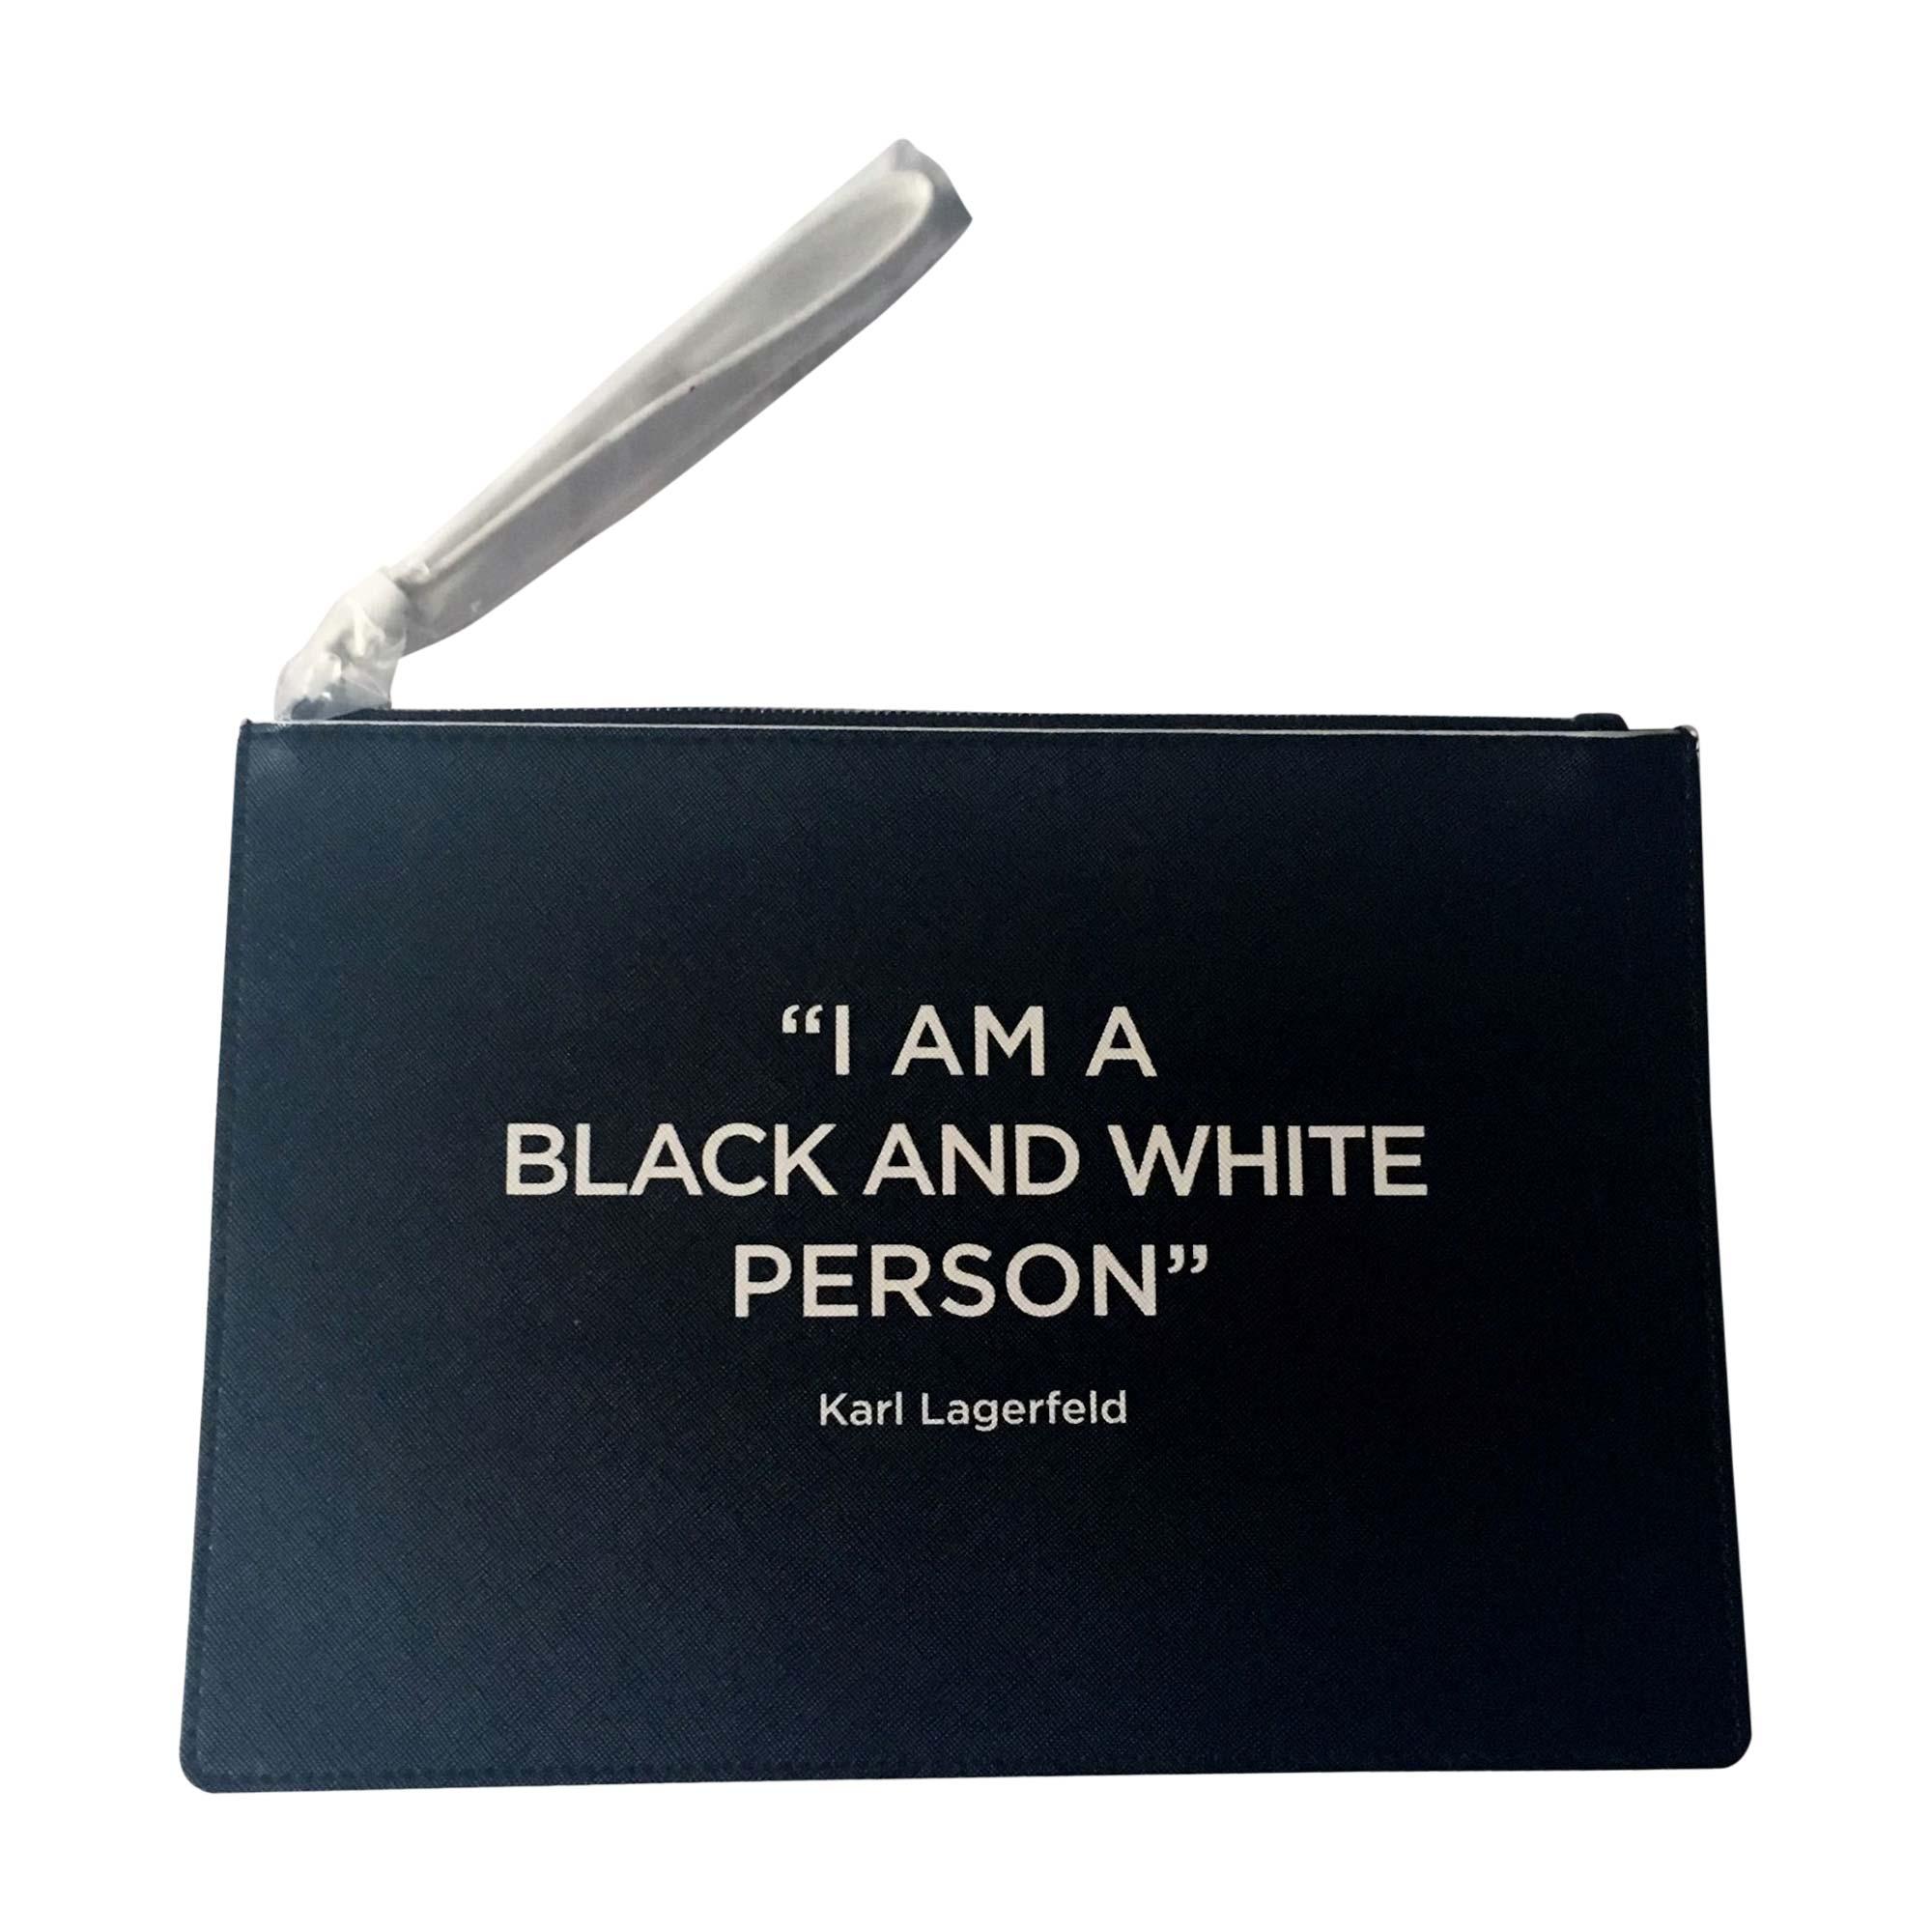 Sac pochette en cuir KARL LAGERFELD Noir